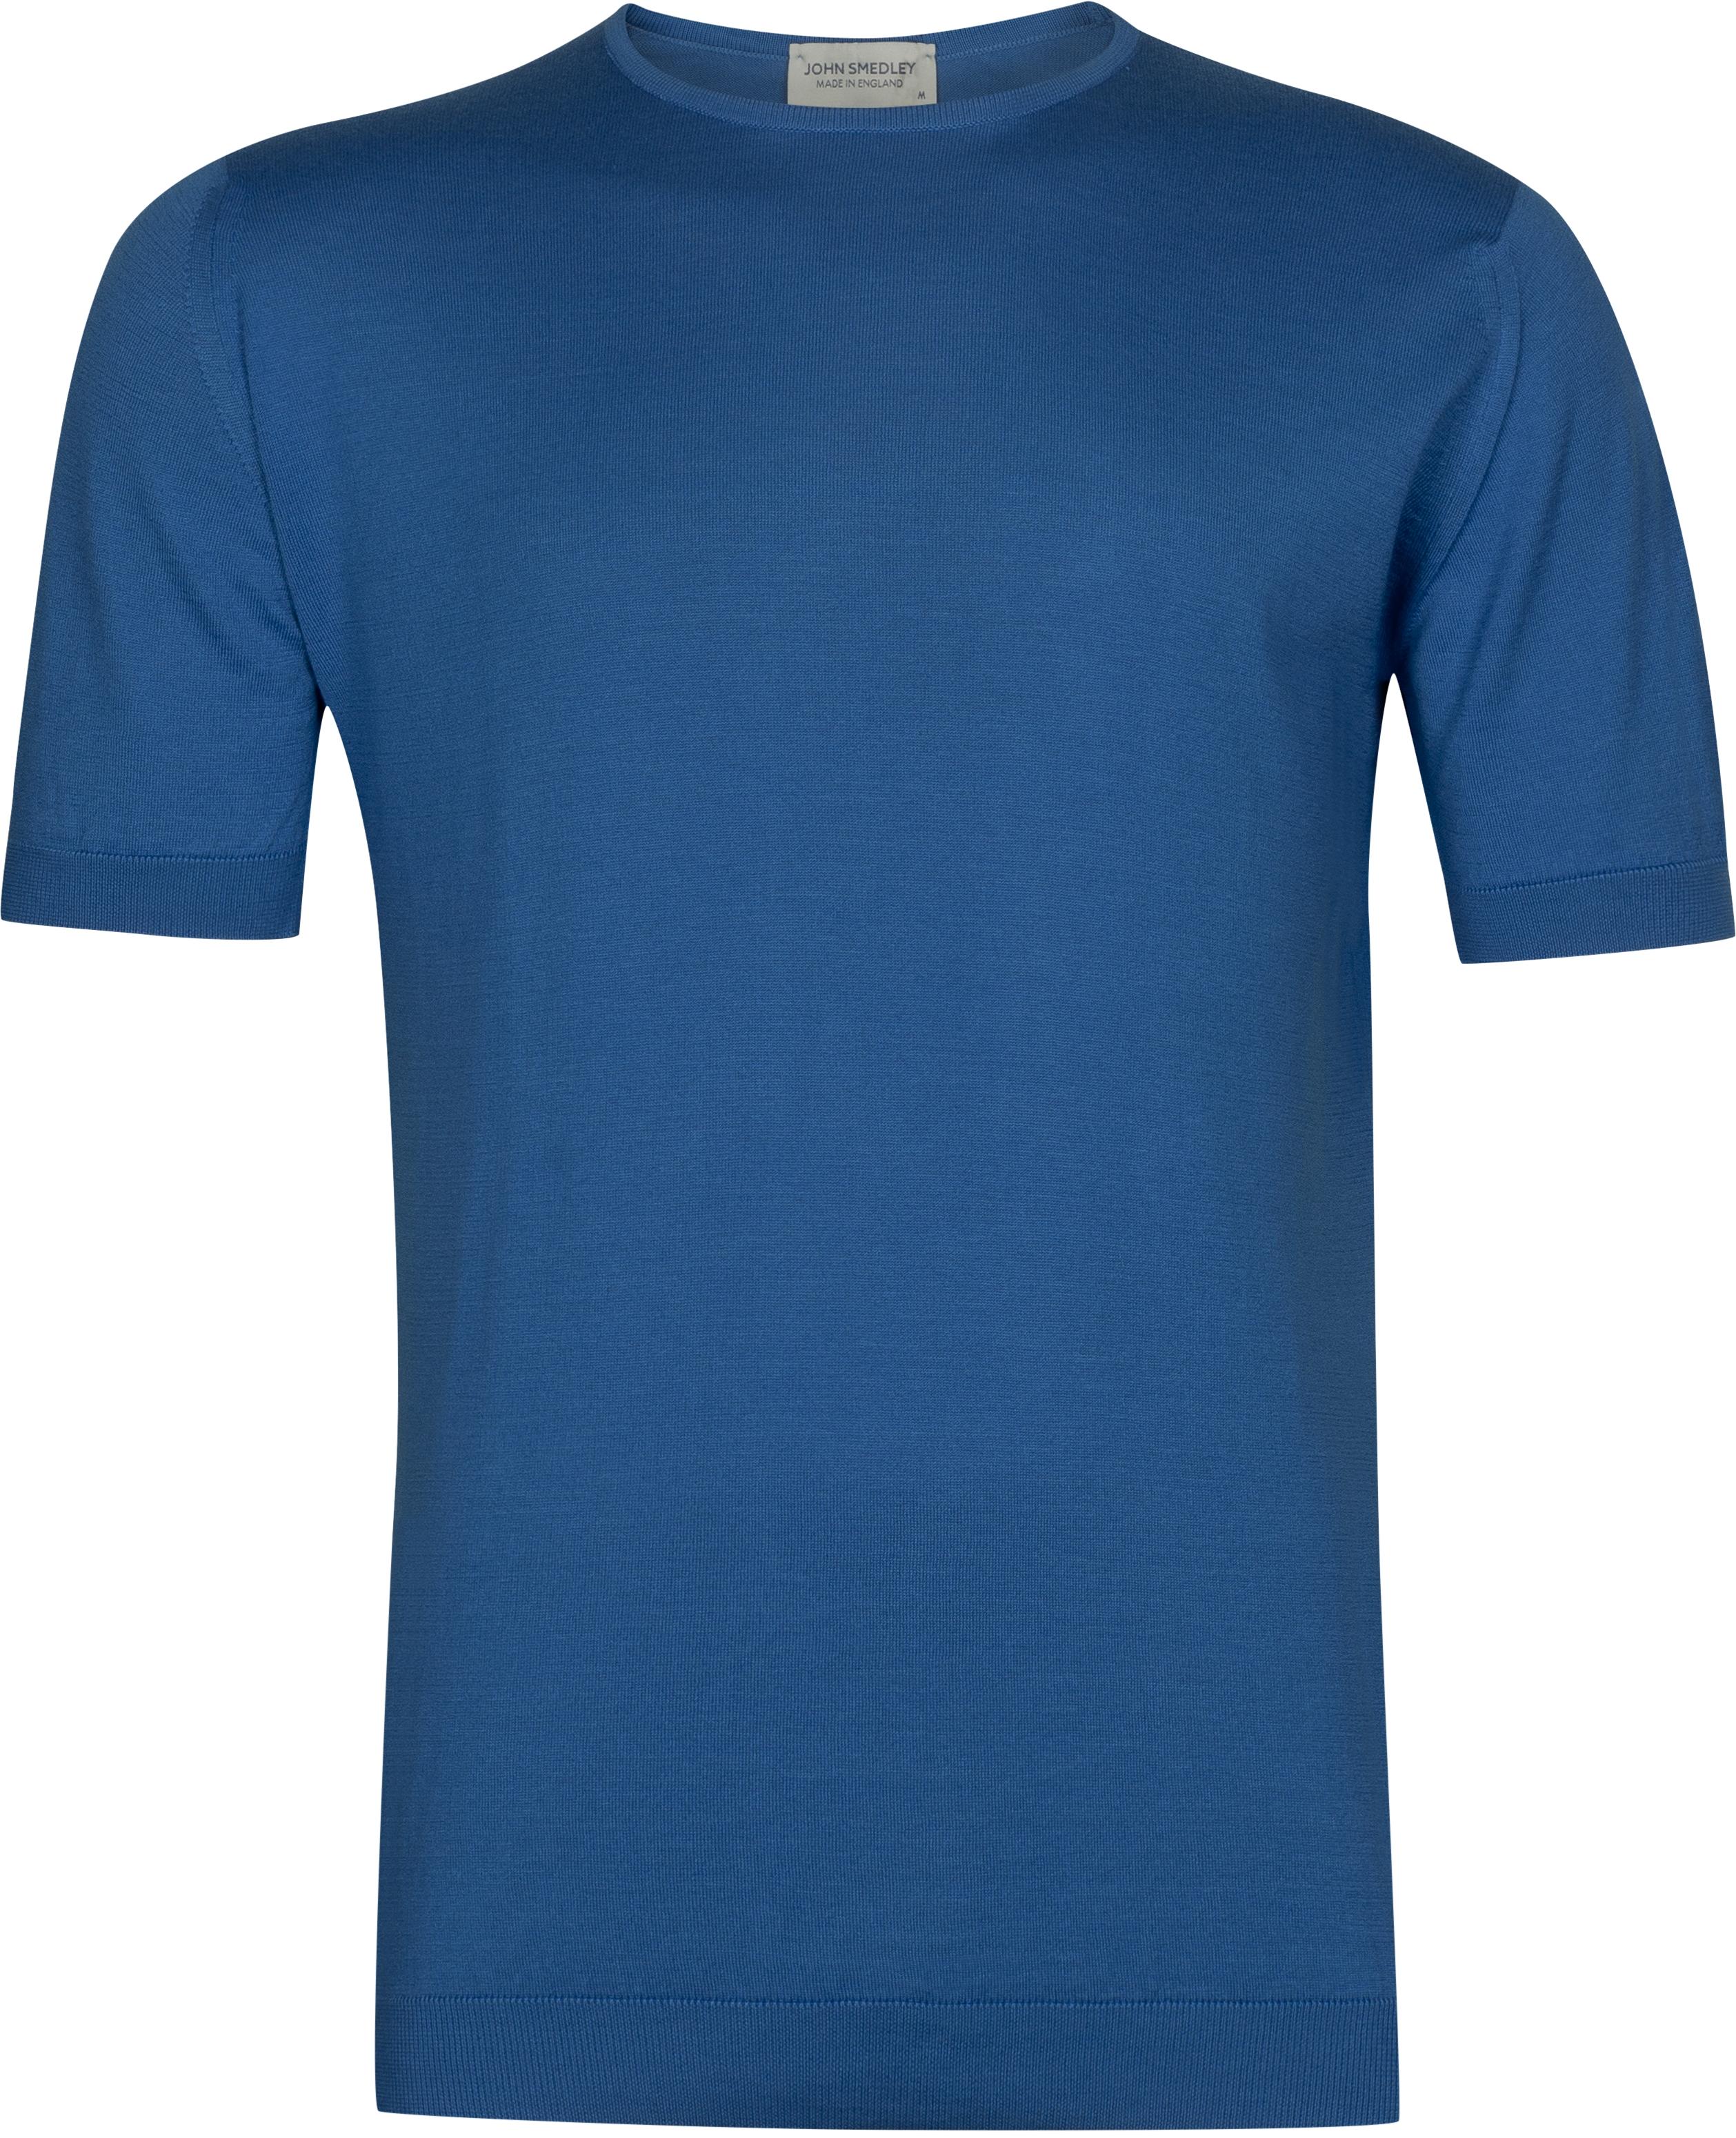 John Smedley Belden in Statice Blue T-Shirt-SML